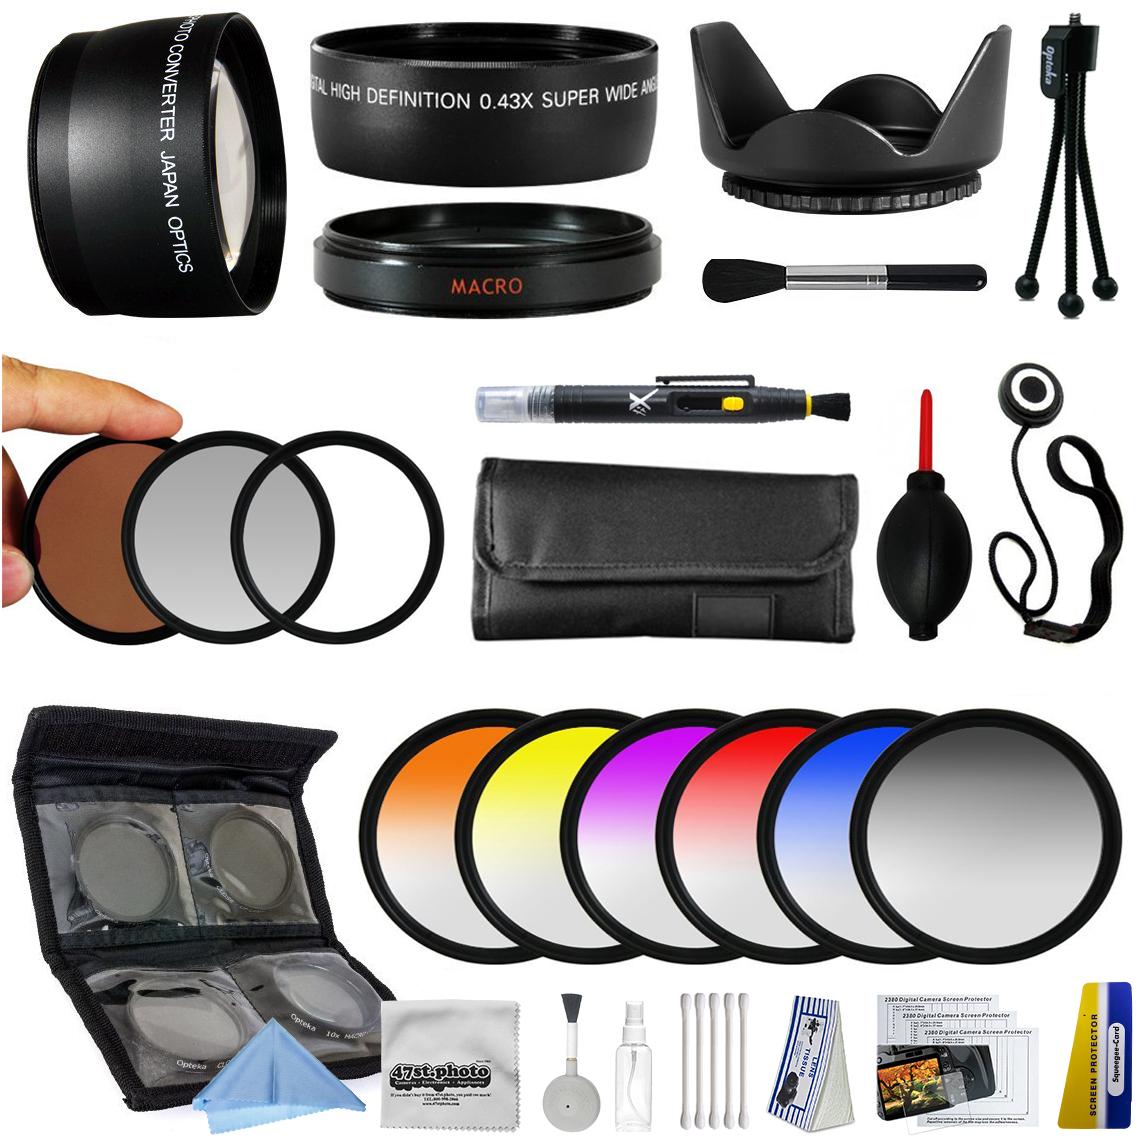 25 Piece Advanced Lens Package For Nikon 1 AW1 J1 J2 V1 V2 S1 J3 Mirrorless Digital Cameras Includes 0.43X + 2.2x Lens + 3 Piece Filters + 6 Piece Colored Graduated Filter Set